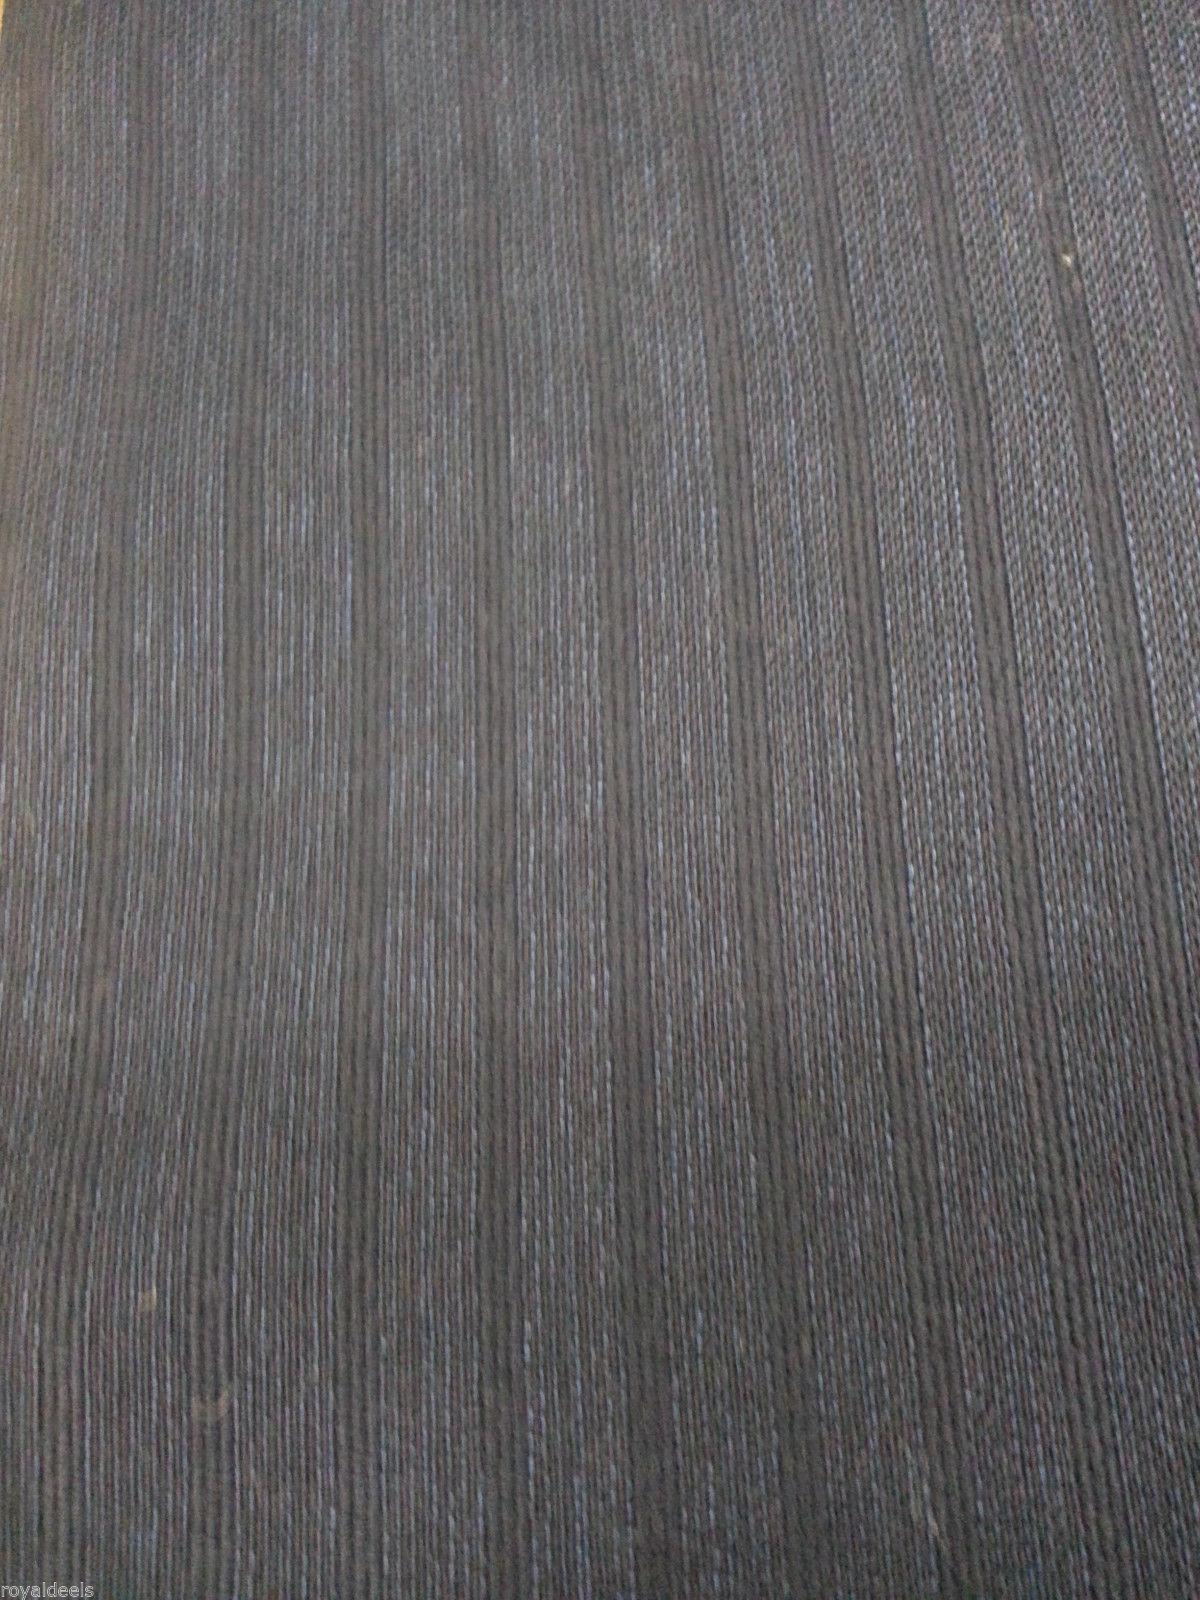 Wool Suit / Skirt  Fabric Striped Navy 120'S ENGLISH FINE WOOL 10 Yard-MSR $1200